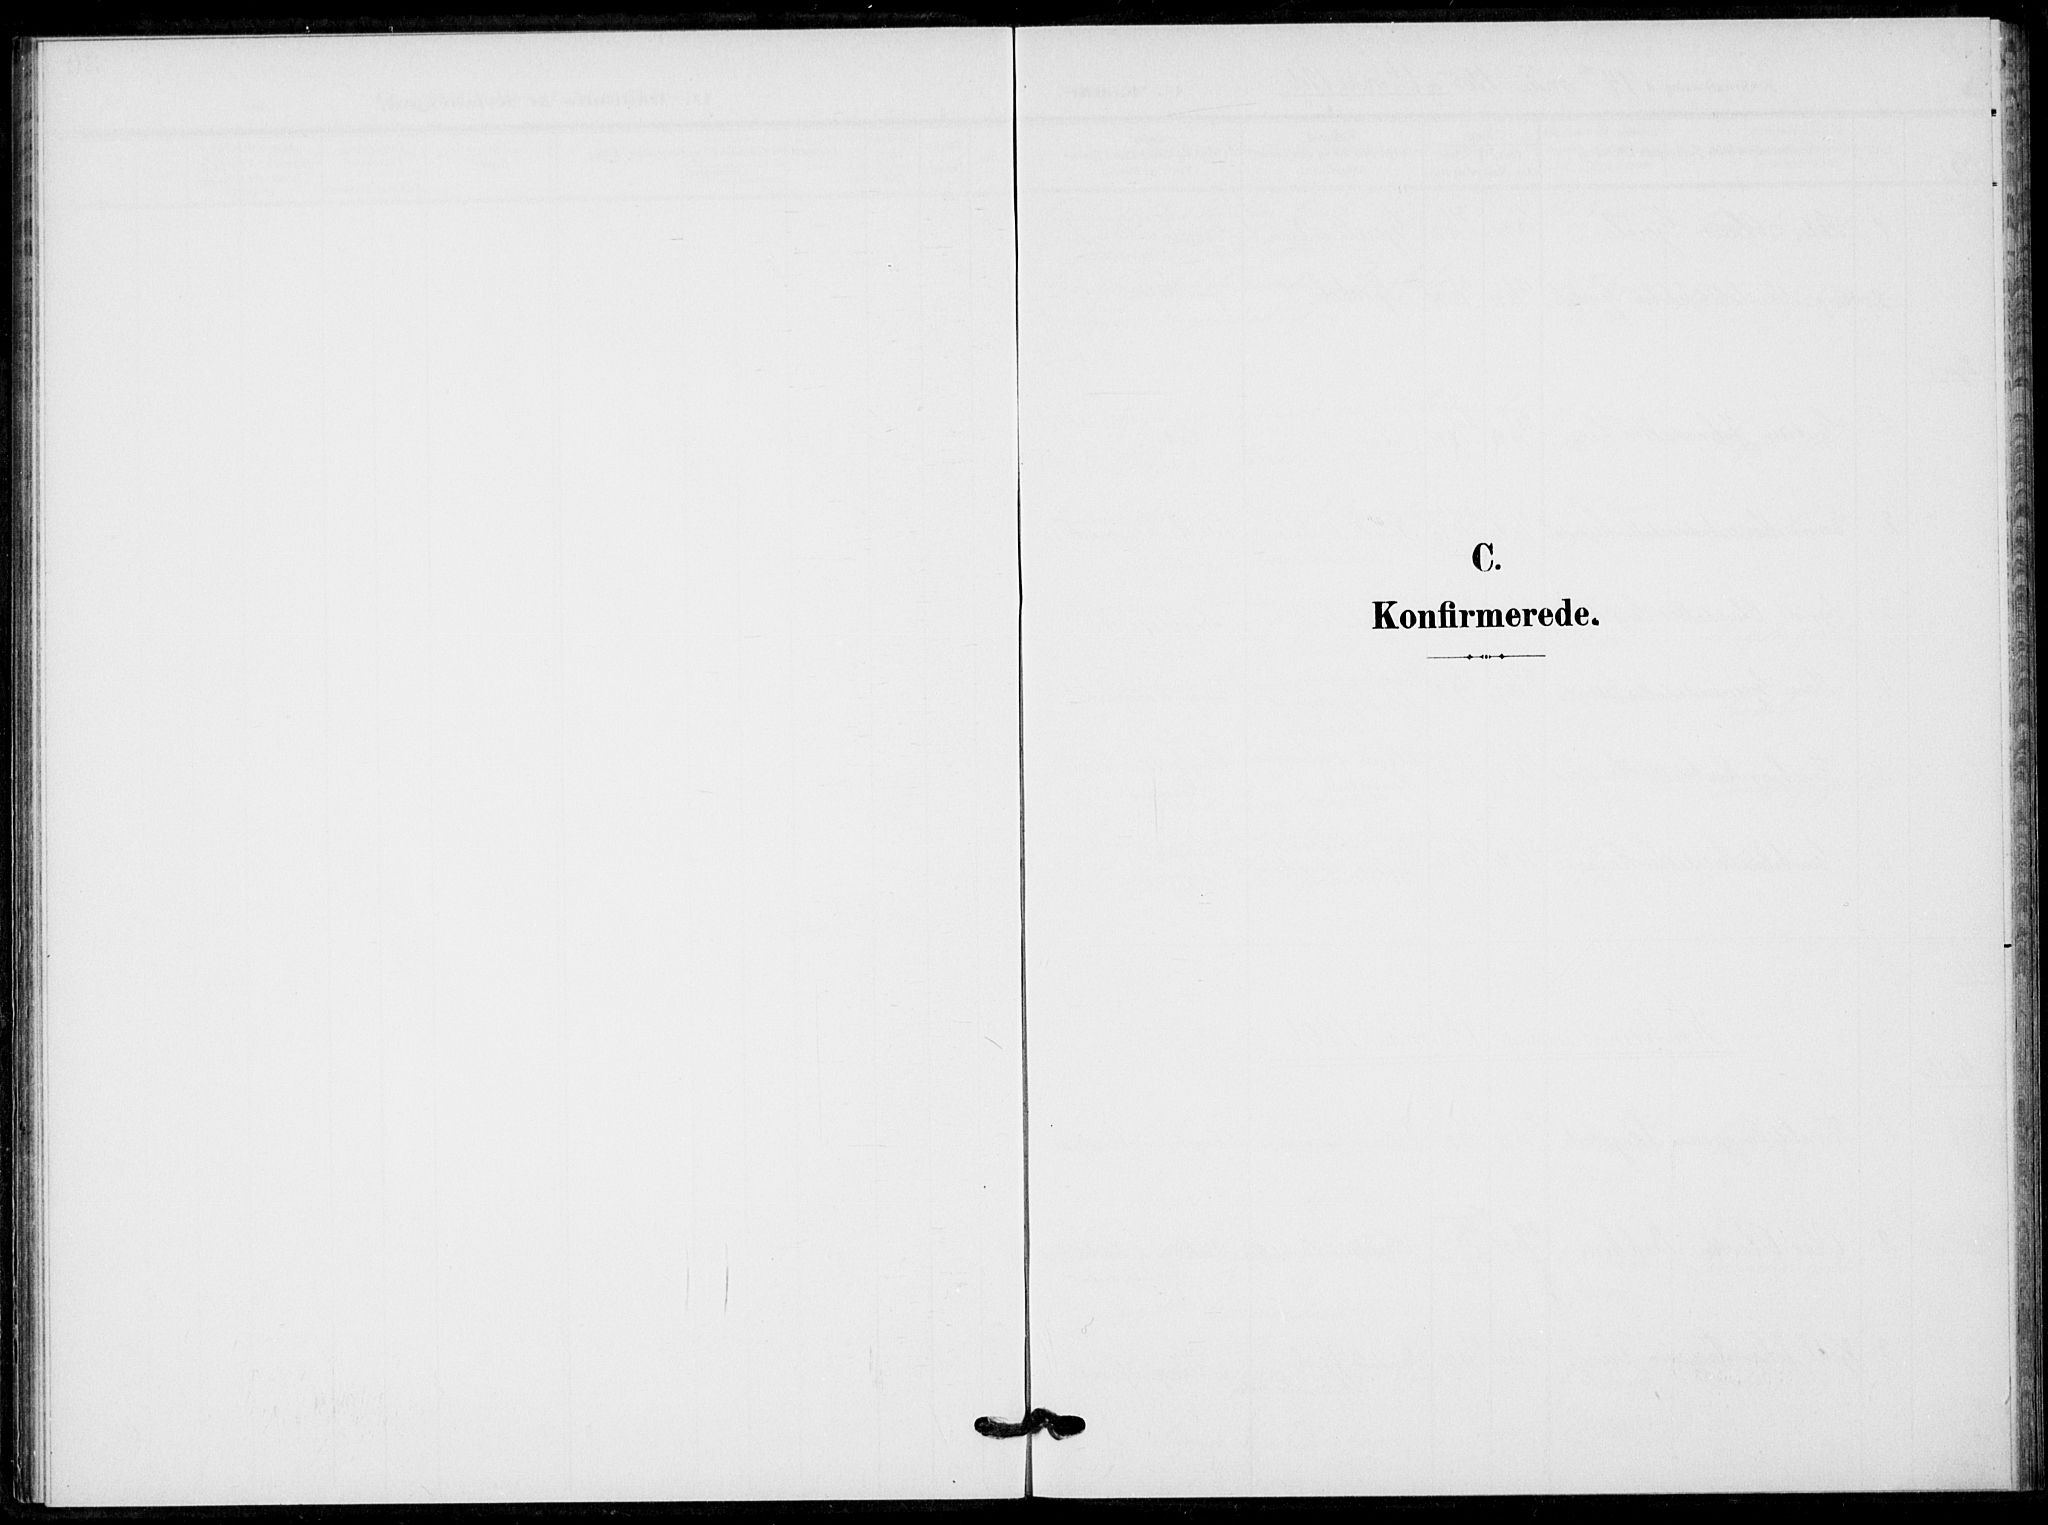 SAKO, Fyresdal kirkebøker, F/Fb/L0004: Parish register (official) no. II 4, 1903-1920